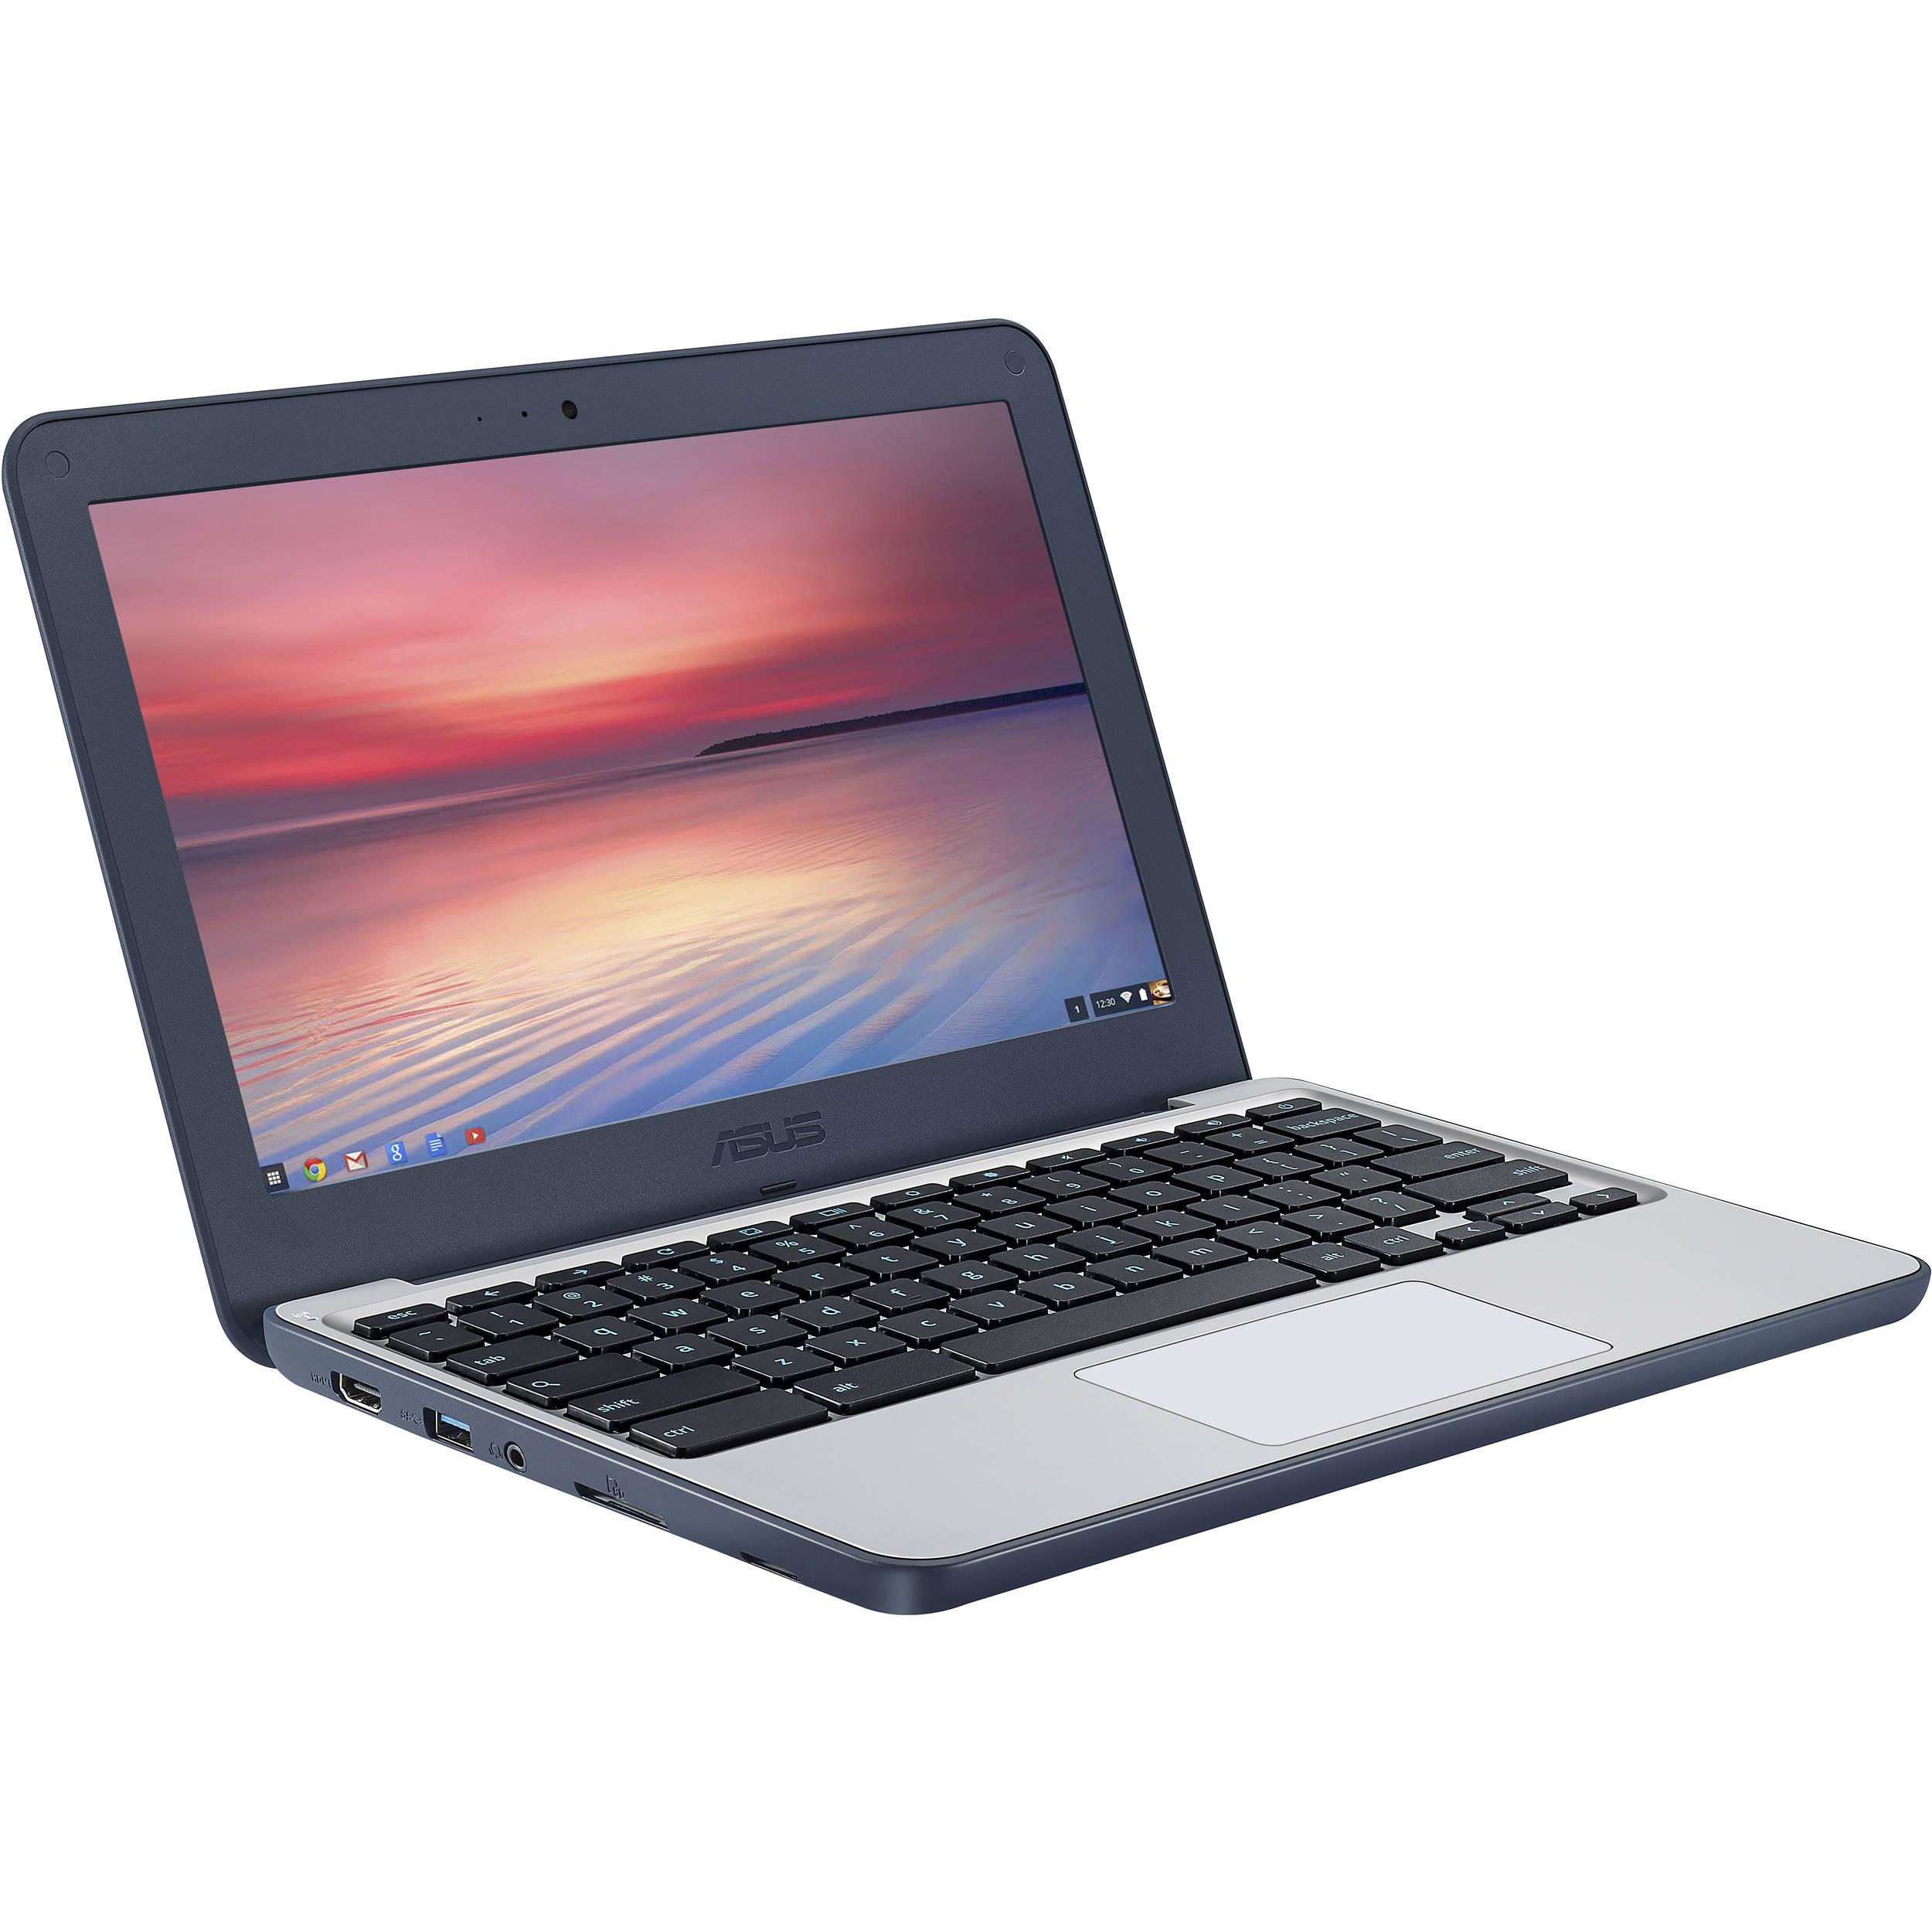 asus chromebook 11.6 review